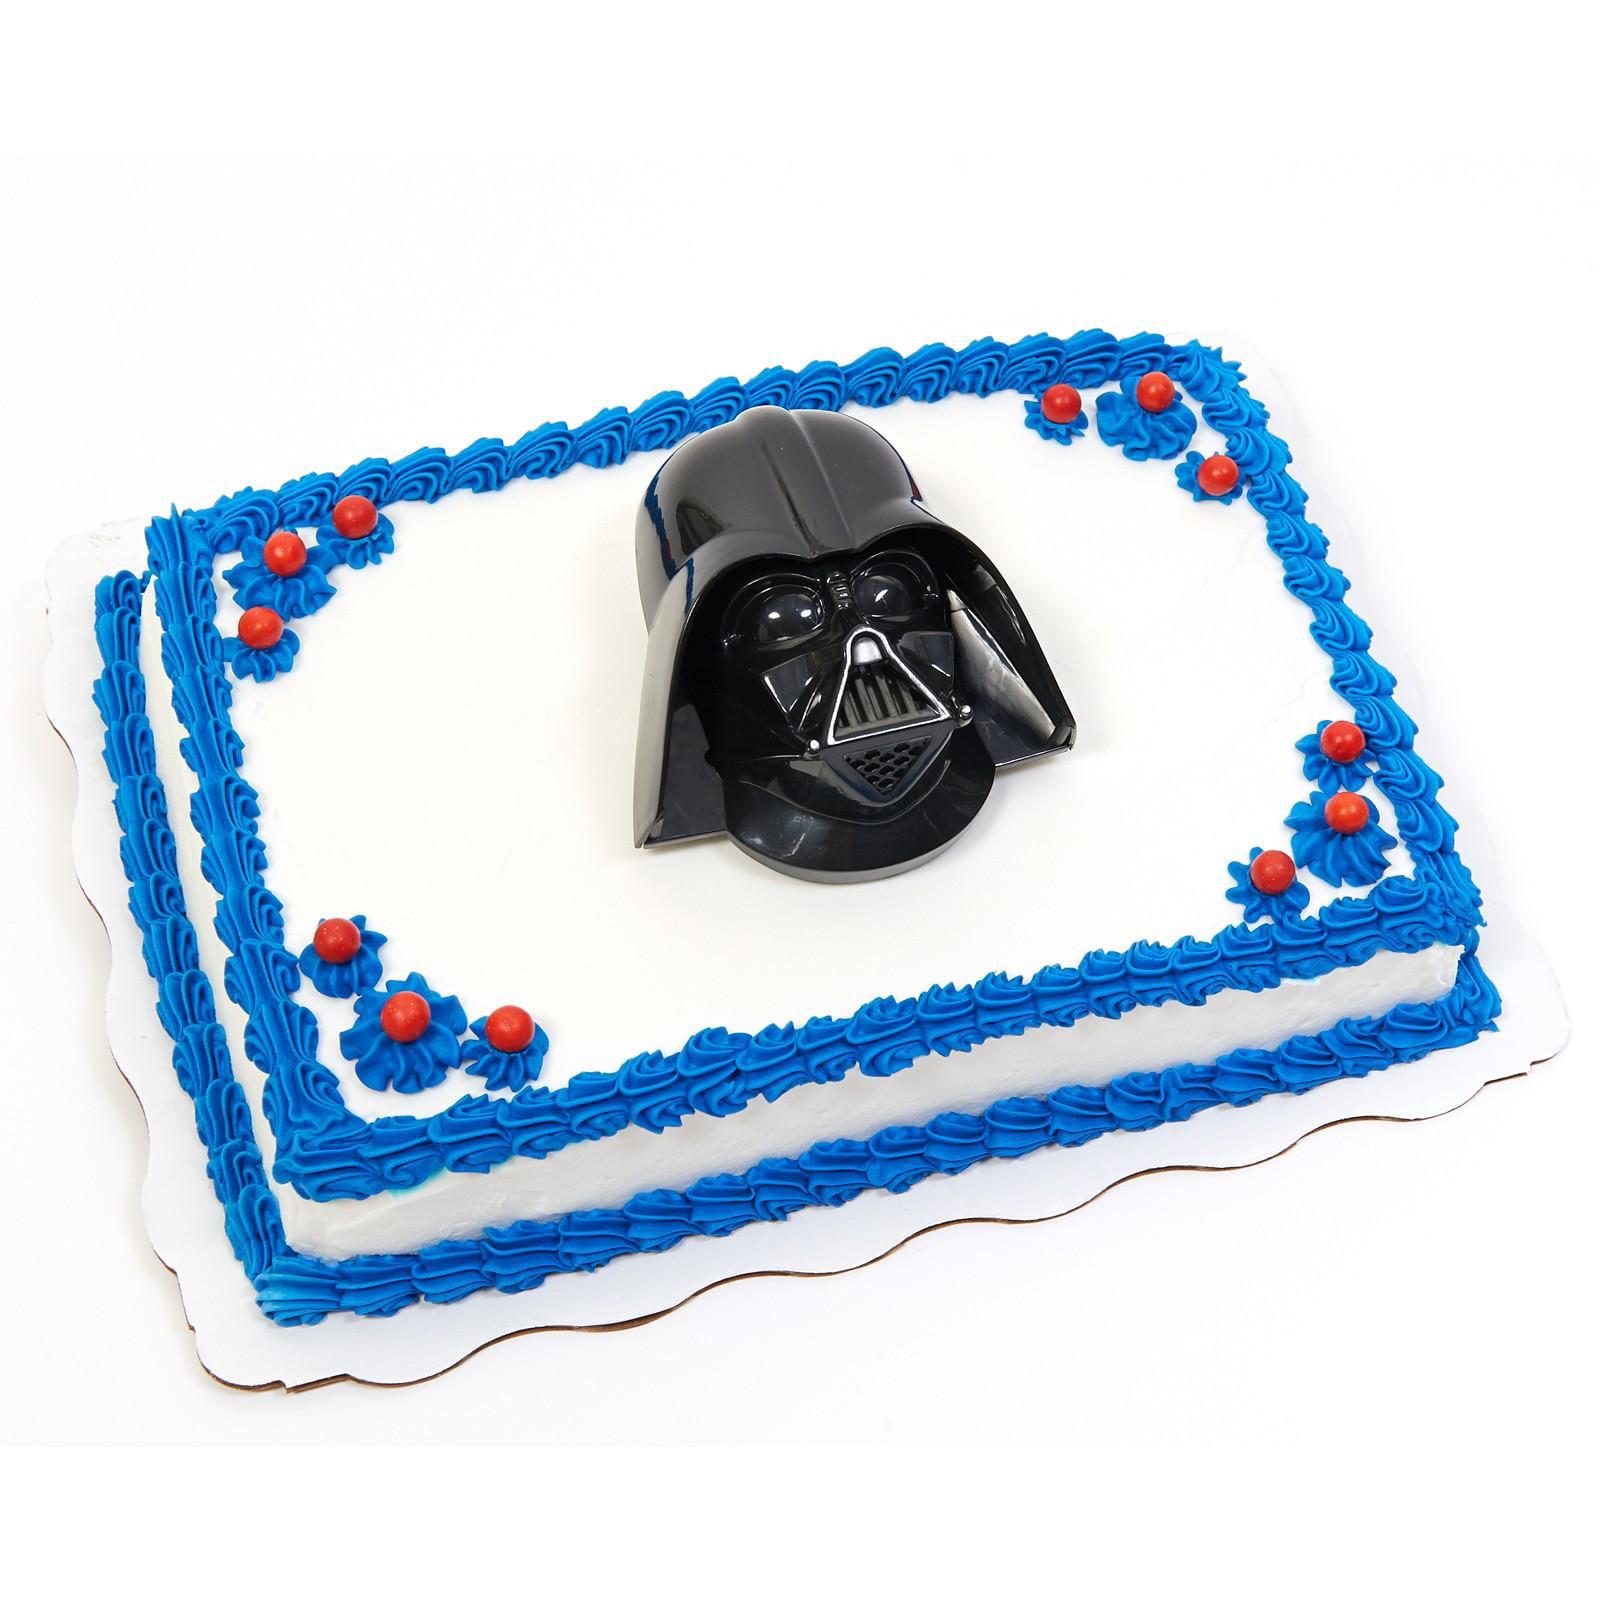 Special Order Cake Decoration Star Wars Darth Vader Walmart